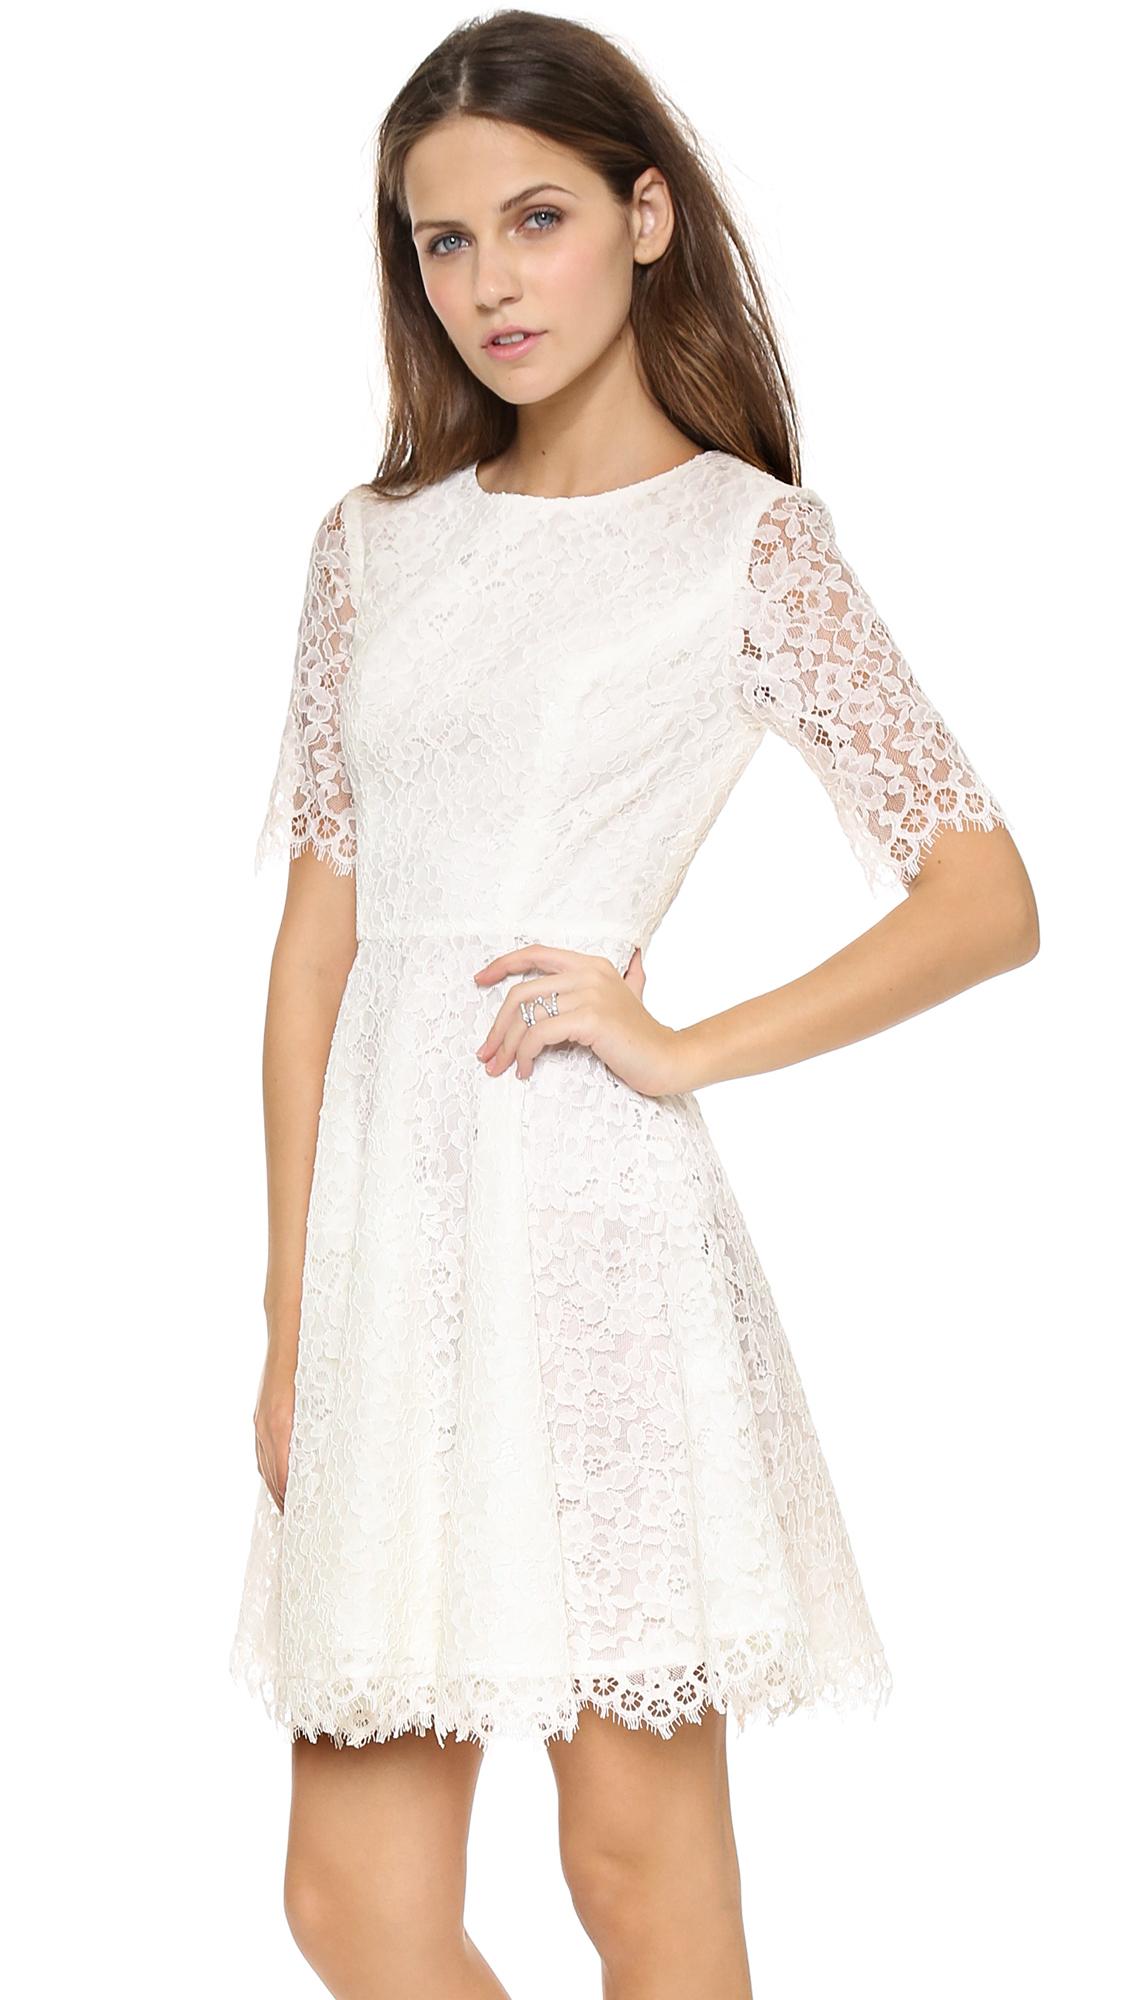 Shoshanna Lace Carmen Dress Ivory in White  Lyst